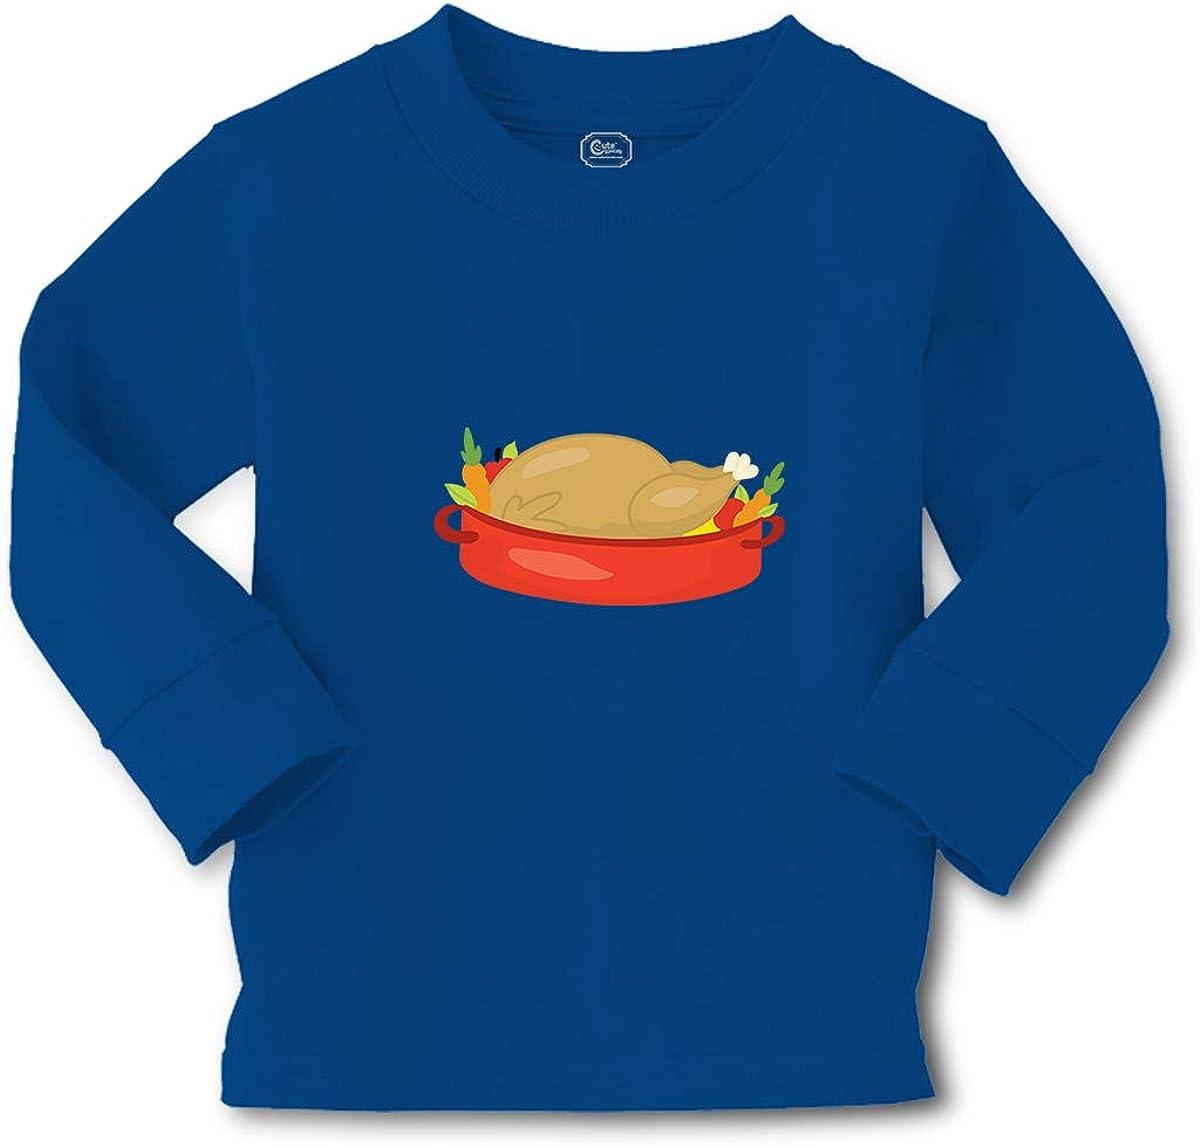 Cute Rascals Kids Long Sleeve T Shirt Thanksgiving Turkey Cotton Boy & Girl Clothes